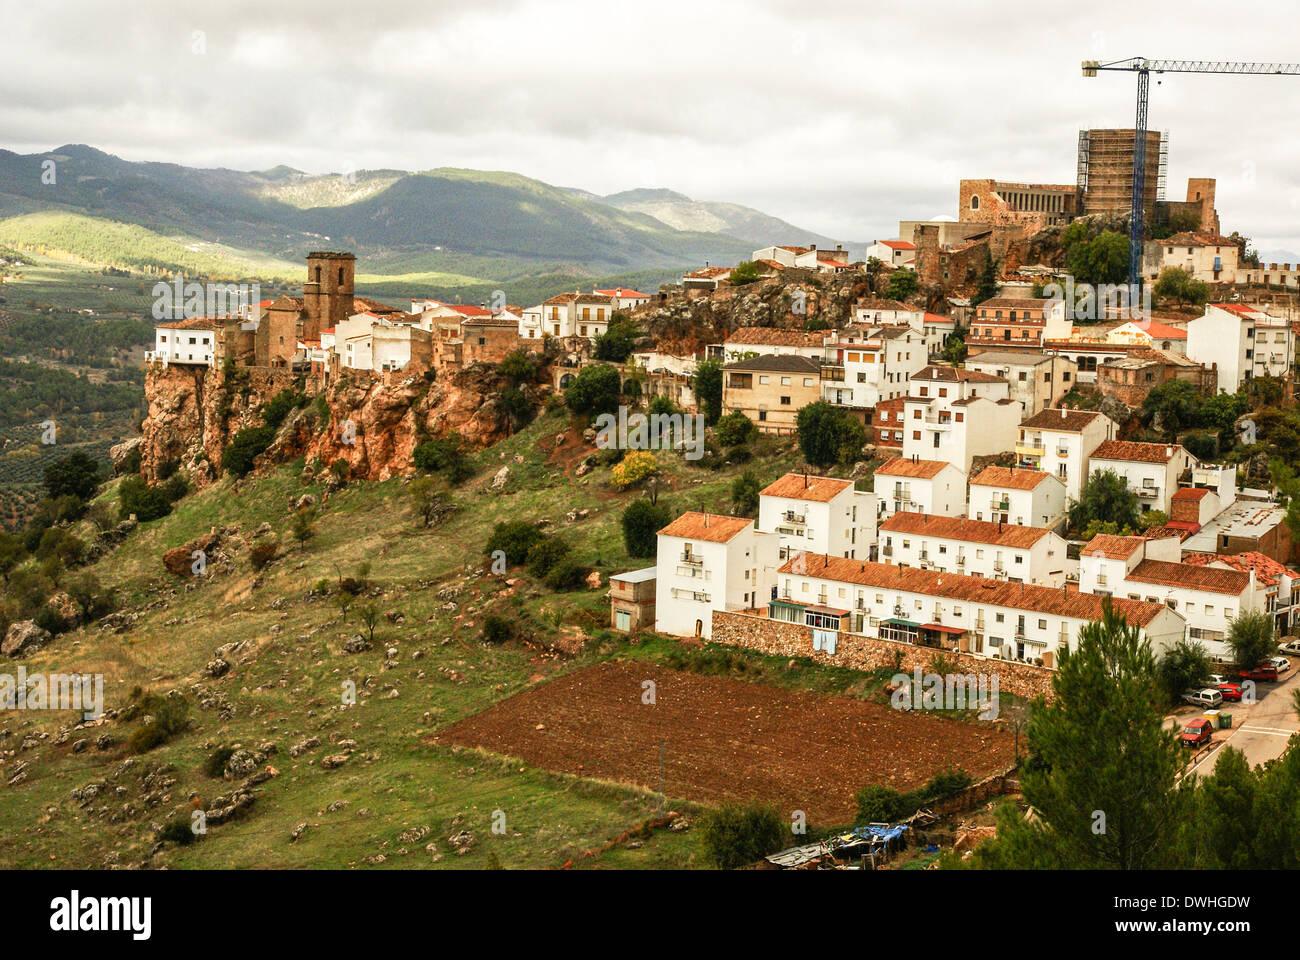 Hornos, Jaen, Andalucia, Spain - Stock Image